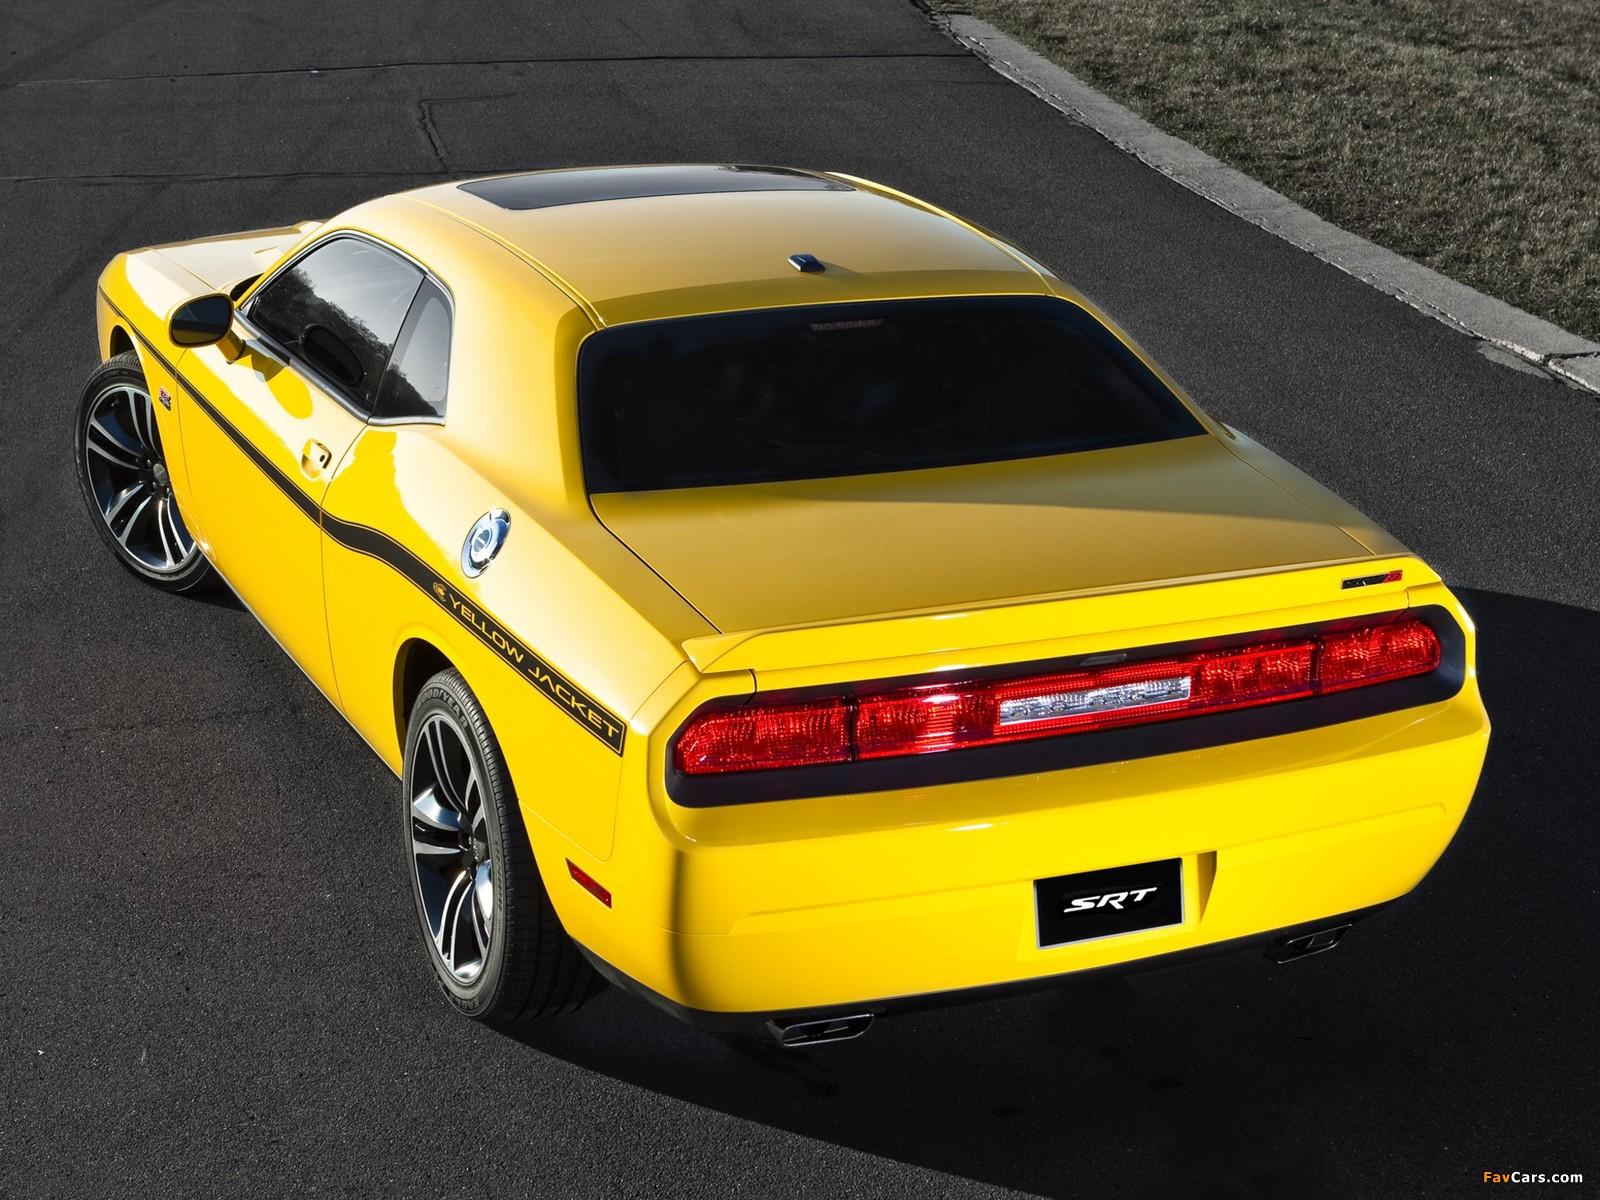 Dodge Challenger SRT8 392 Yellow Jacket (LC) 2012 photos (1600 x 1200)